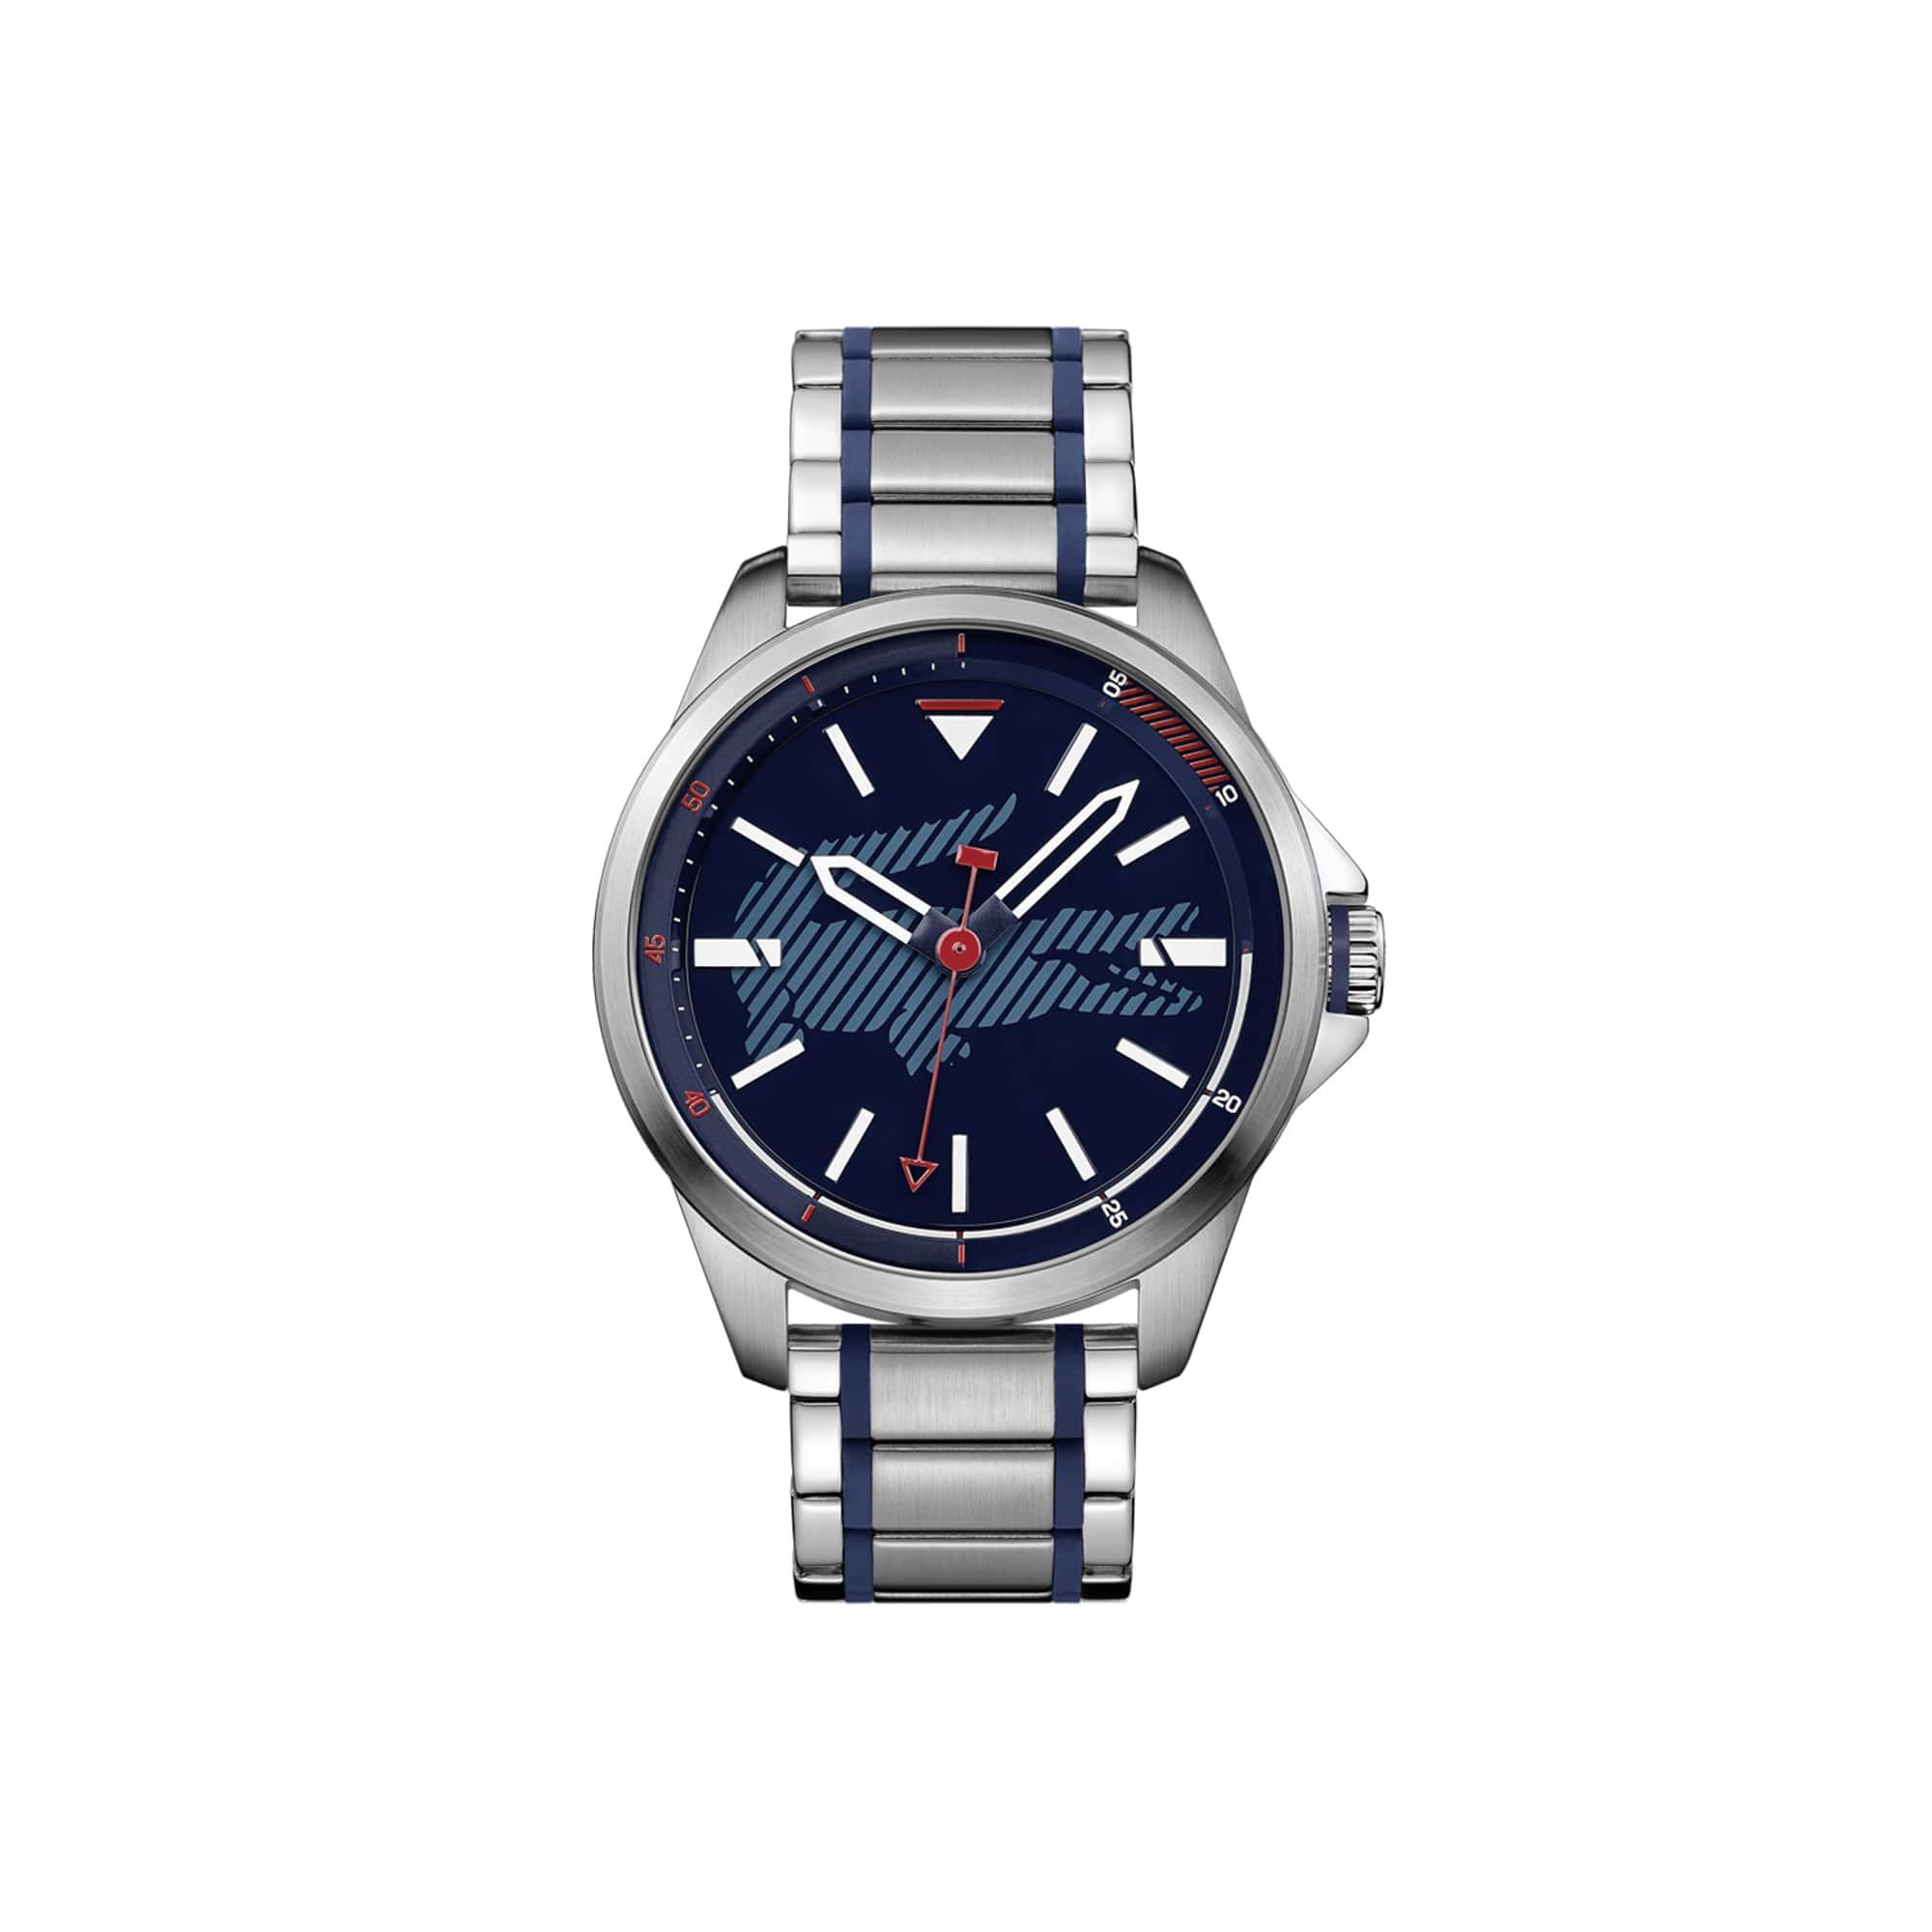 Reloj de Hombre Capbreton con Pulsera de Acero Inoxidable con detalles de Silicona Azul